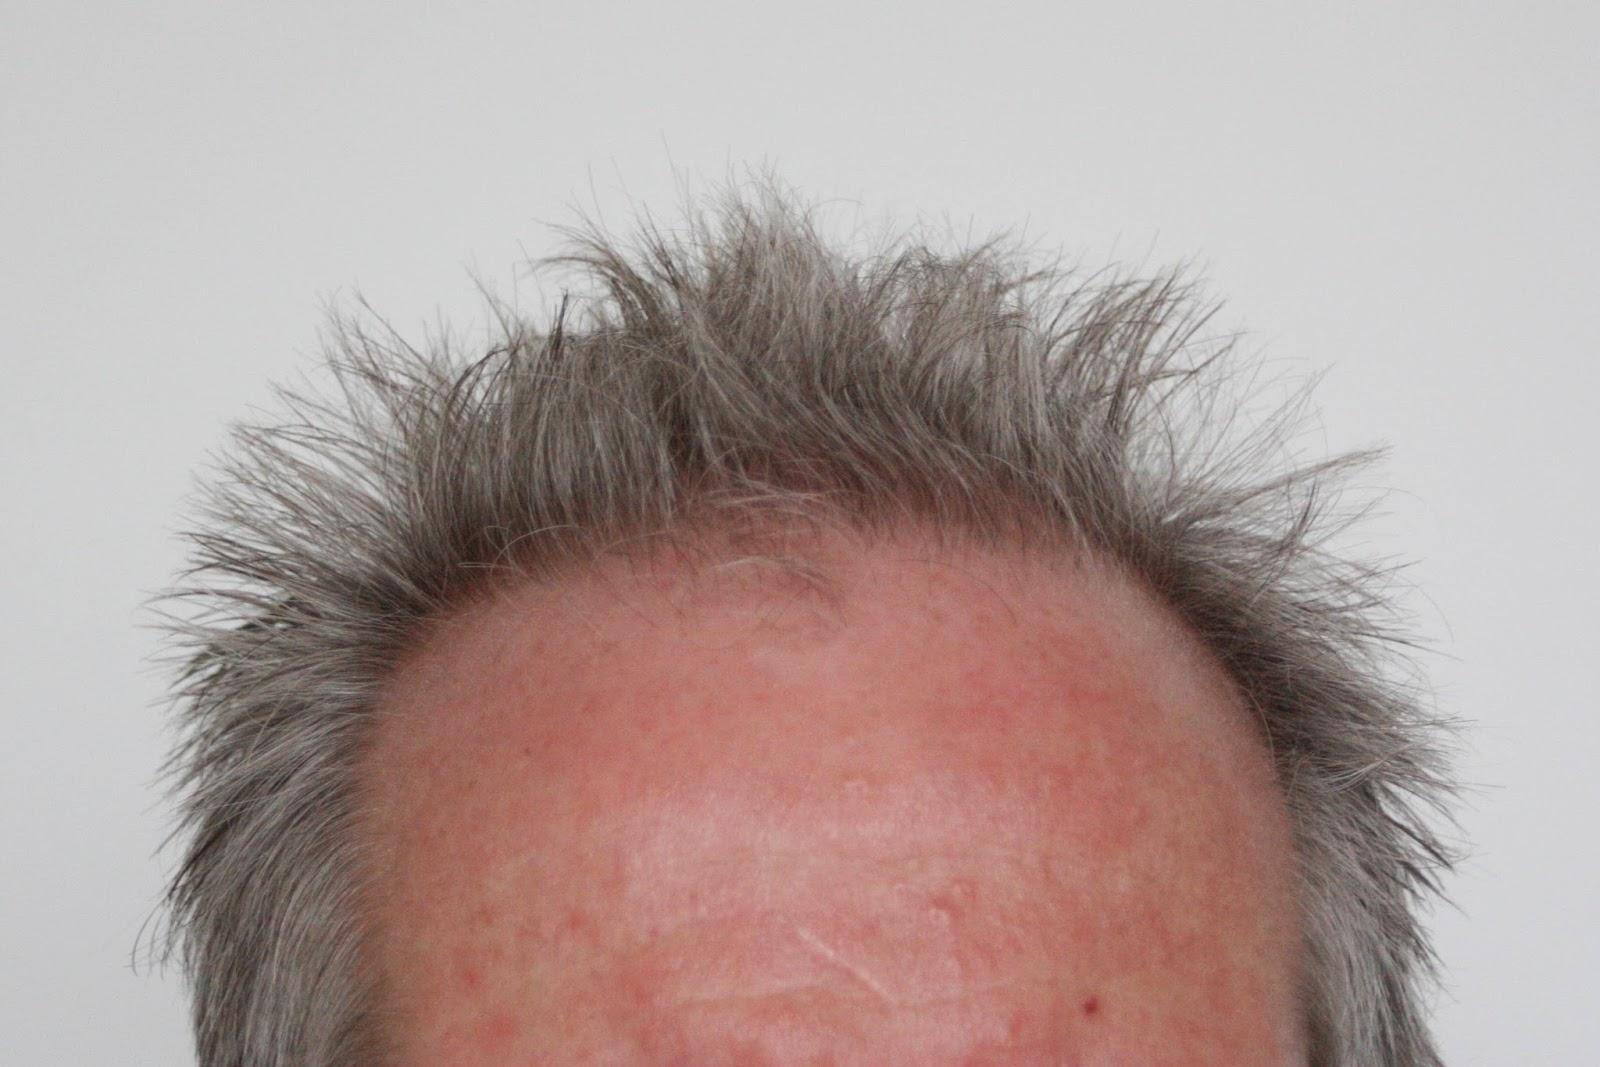 man's forehead